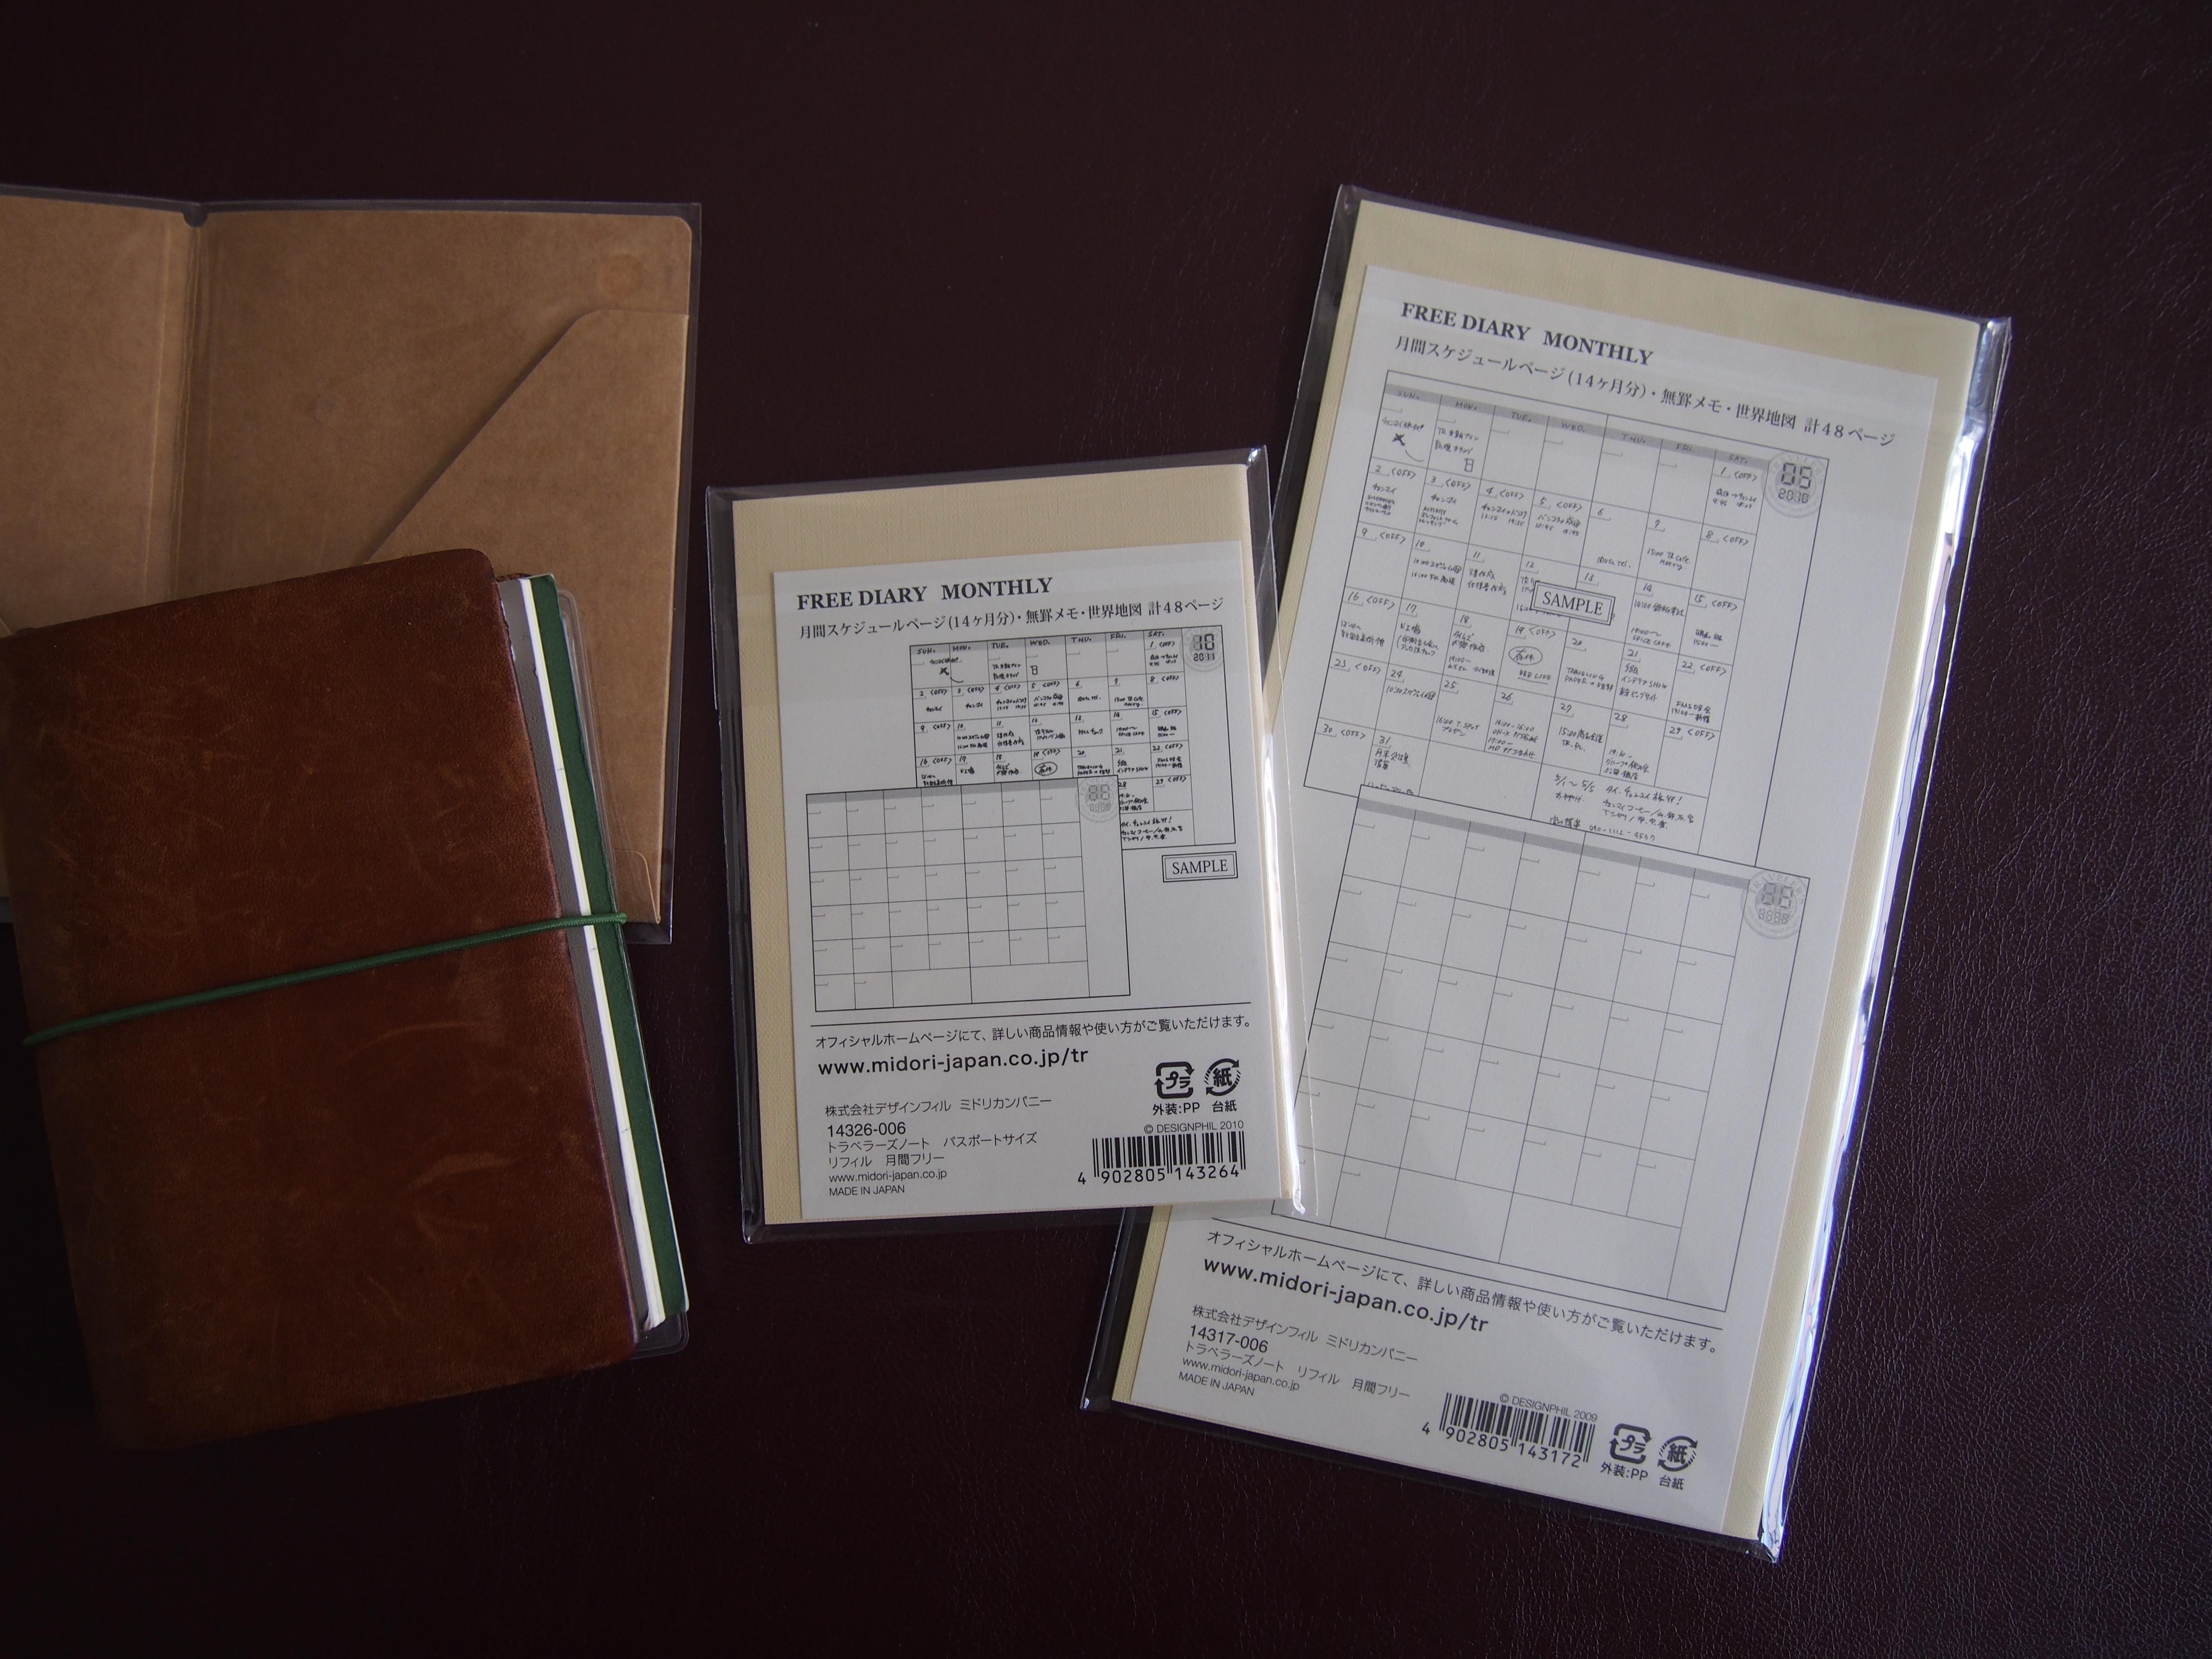 Midori 017 Regular 006 Passport Traveler's Notebooks Monthly Calendar Inserts at Wonder Pens Toronto, Canada